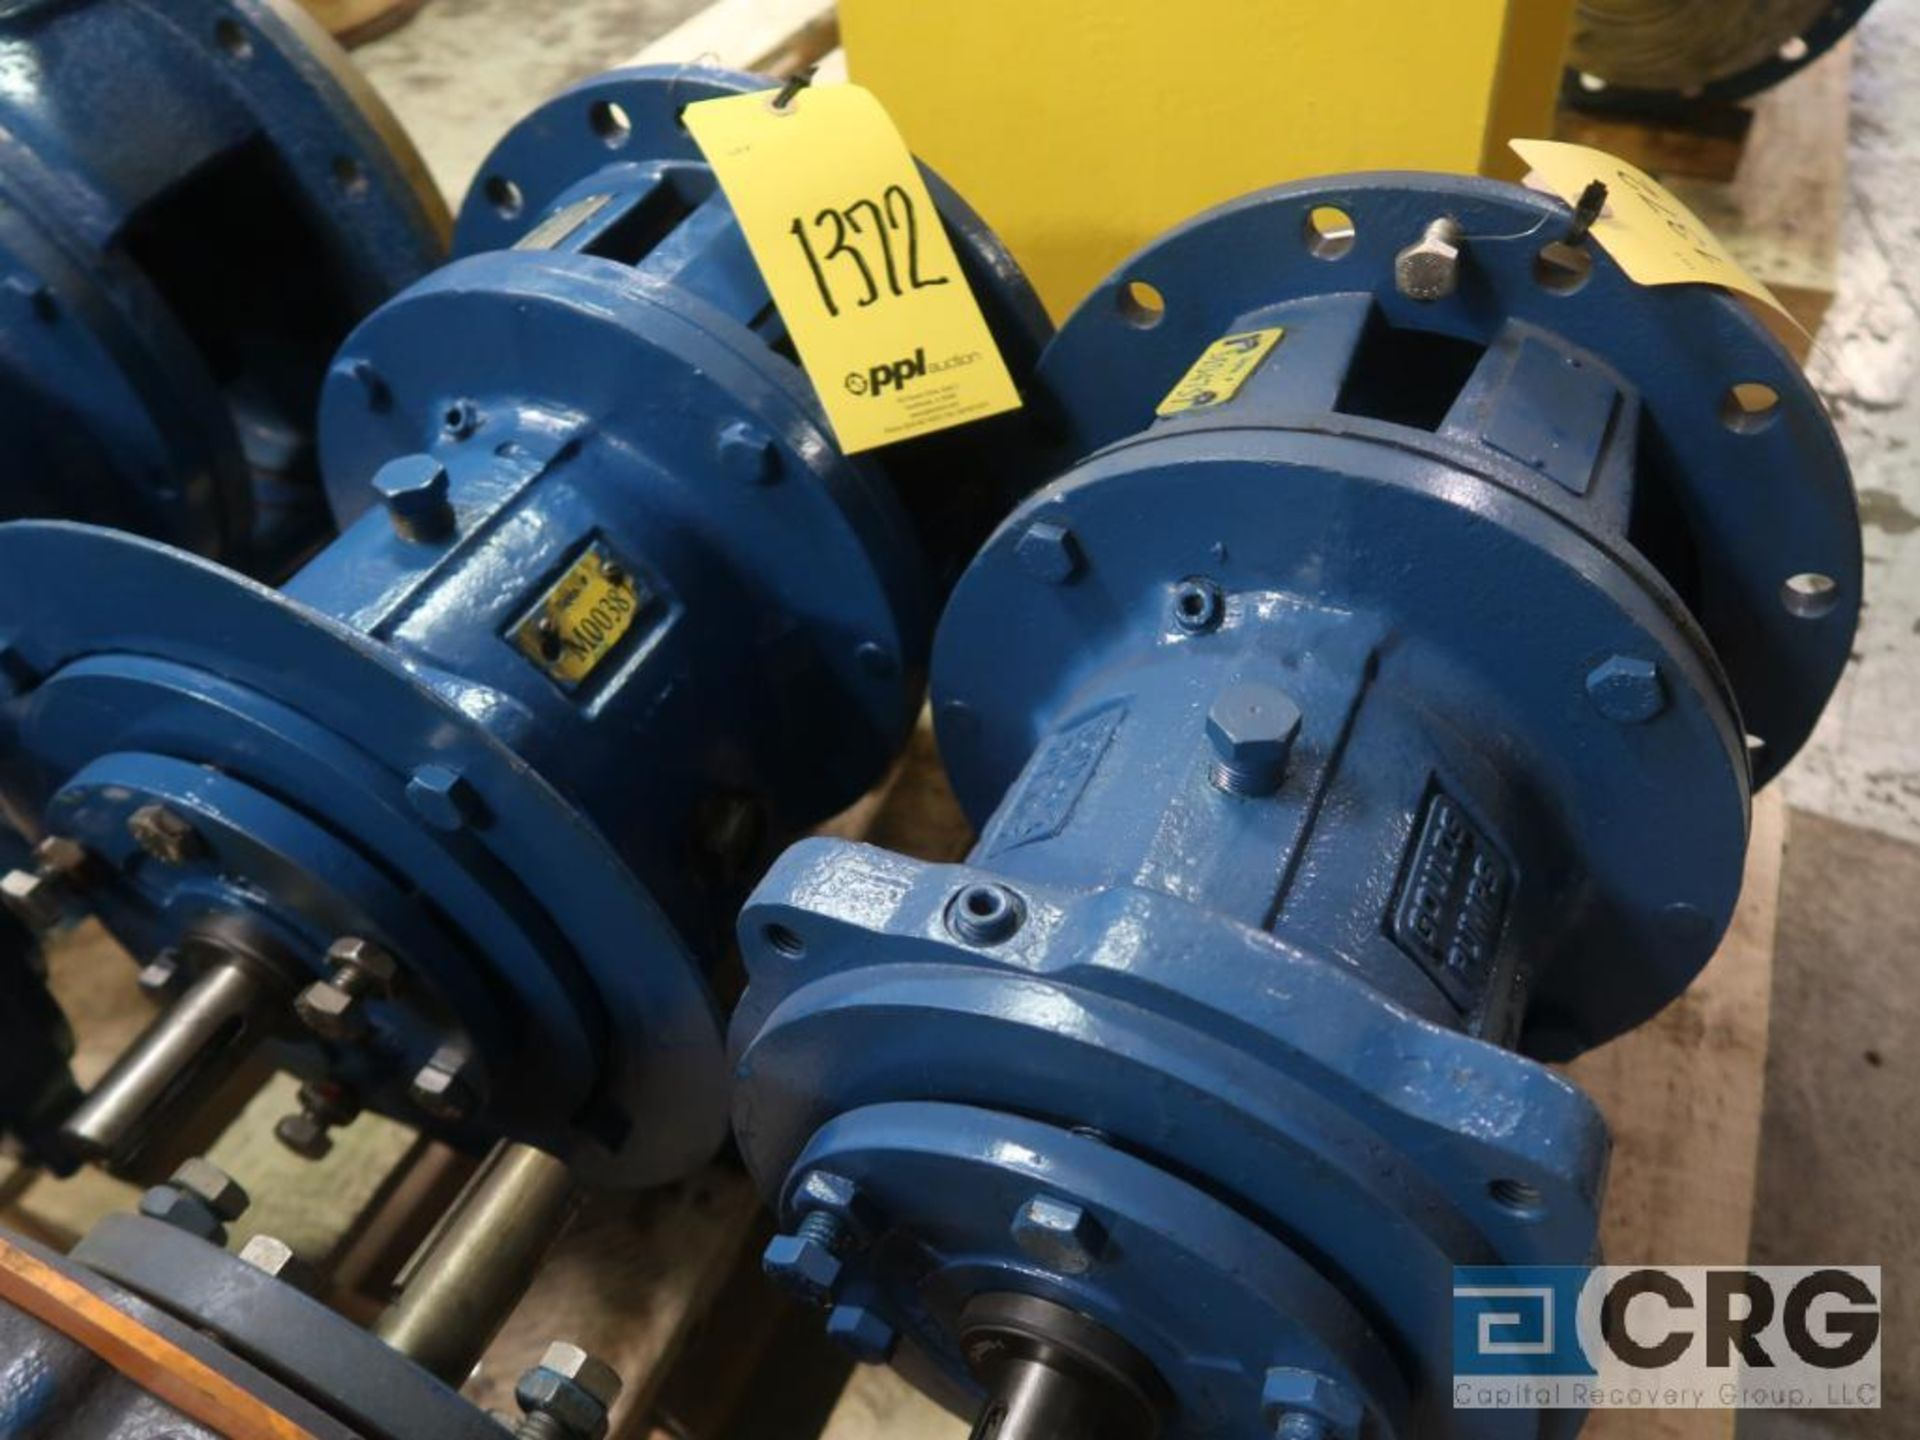 Lot of (2) Goulds 3196 MT 10 in. pumps (Basement Stores)